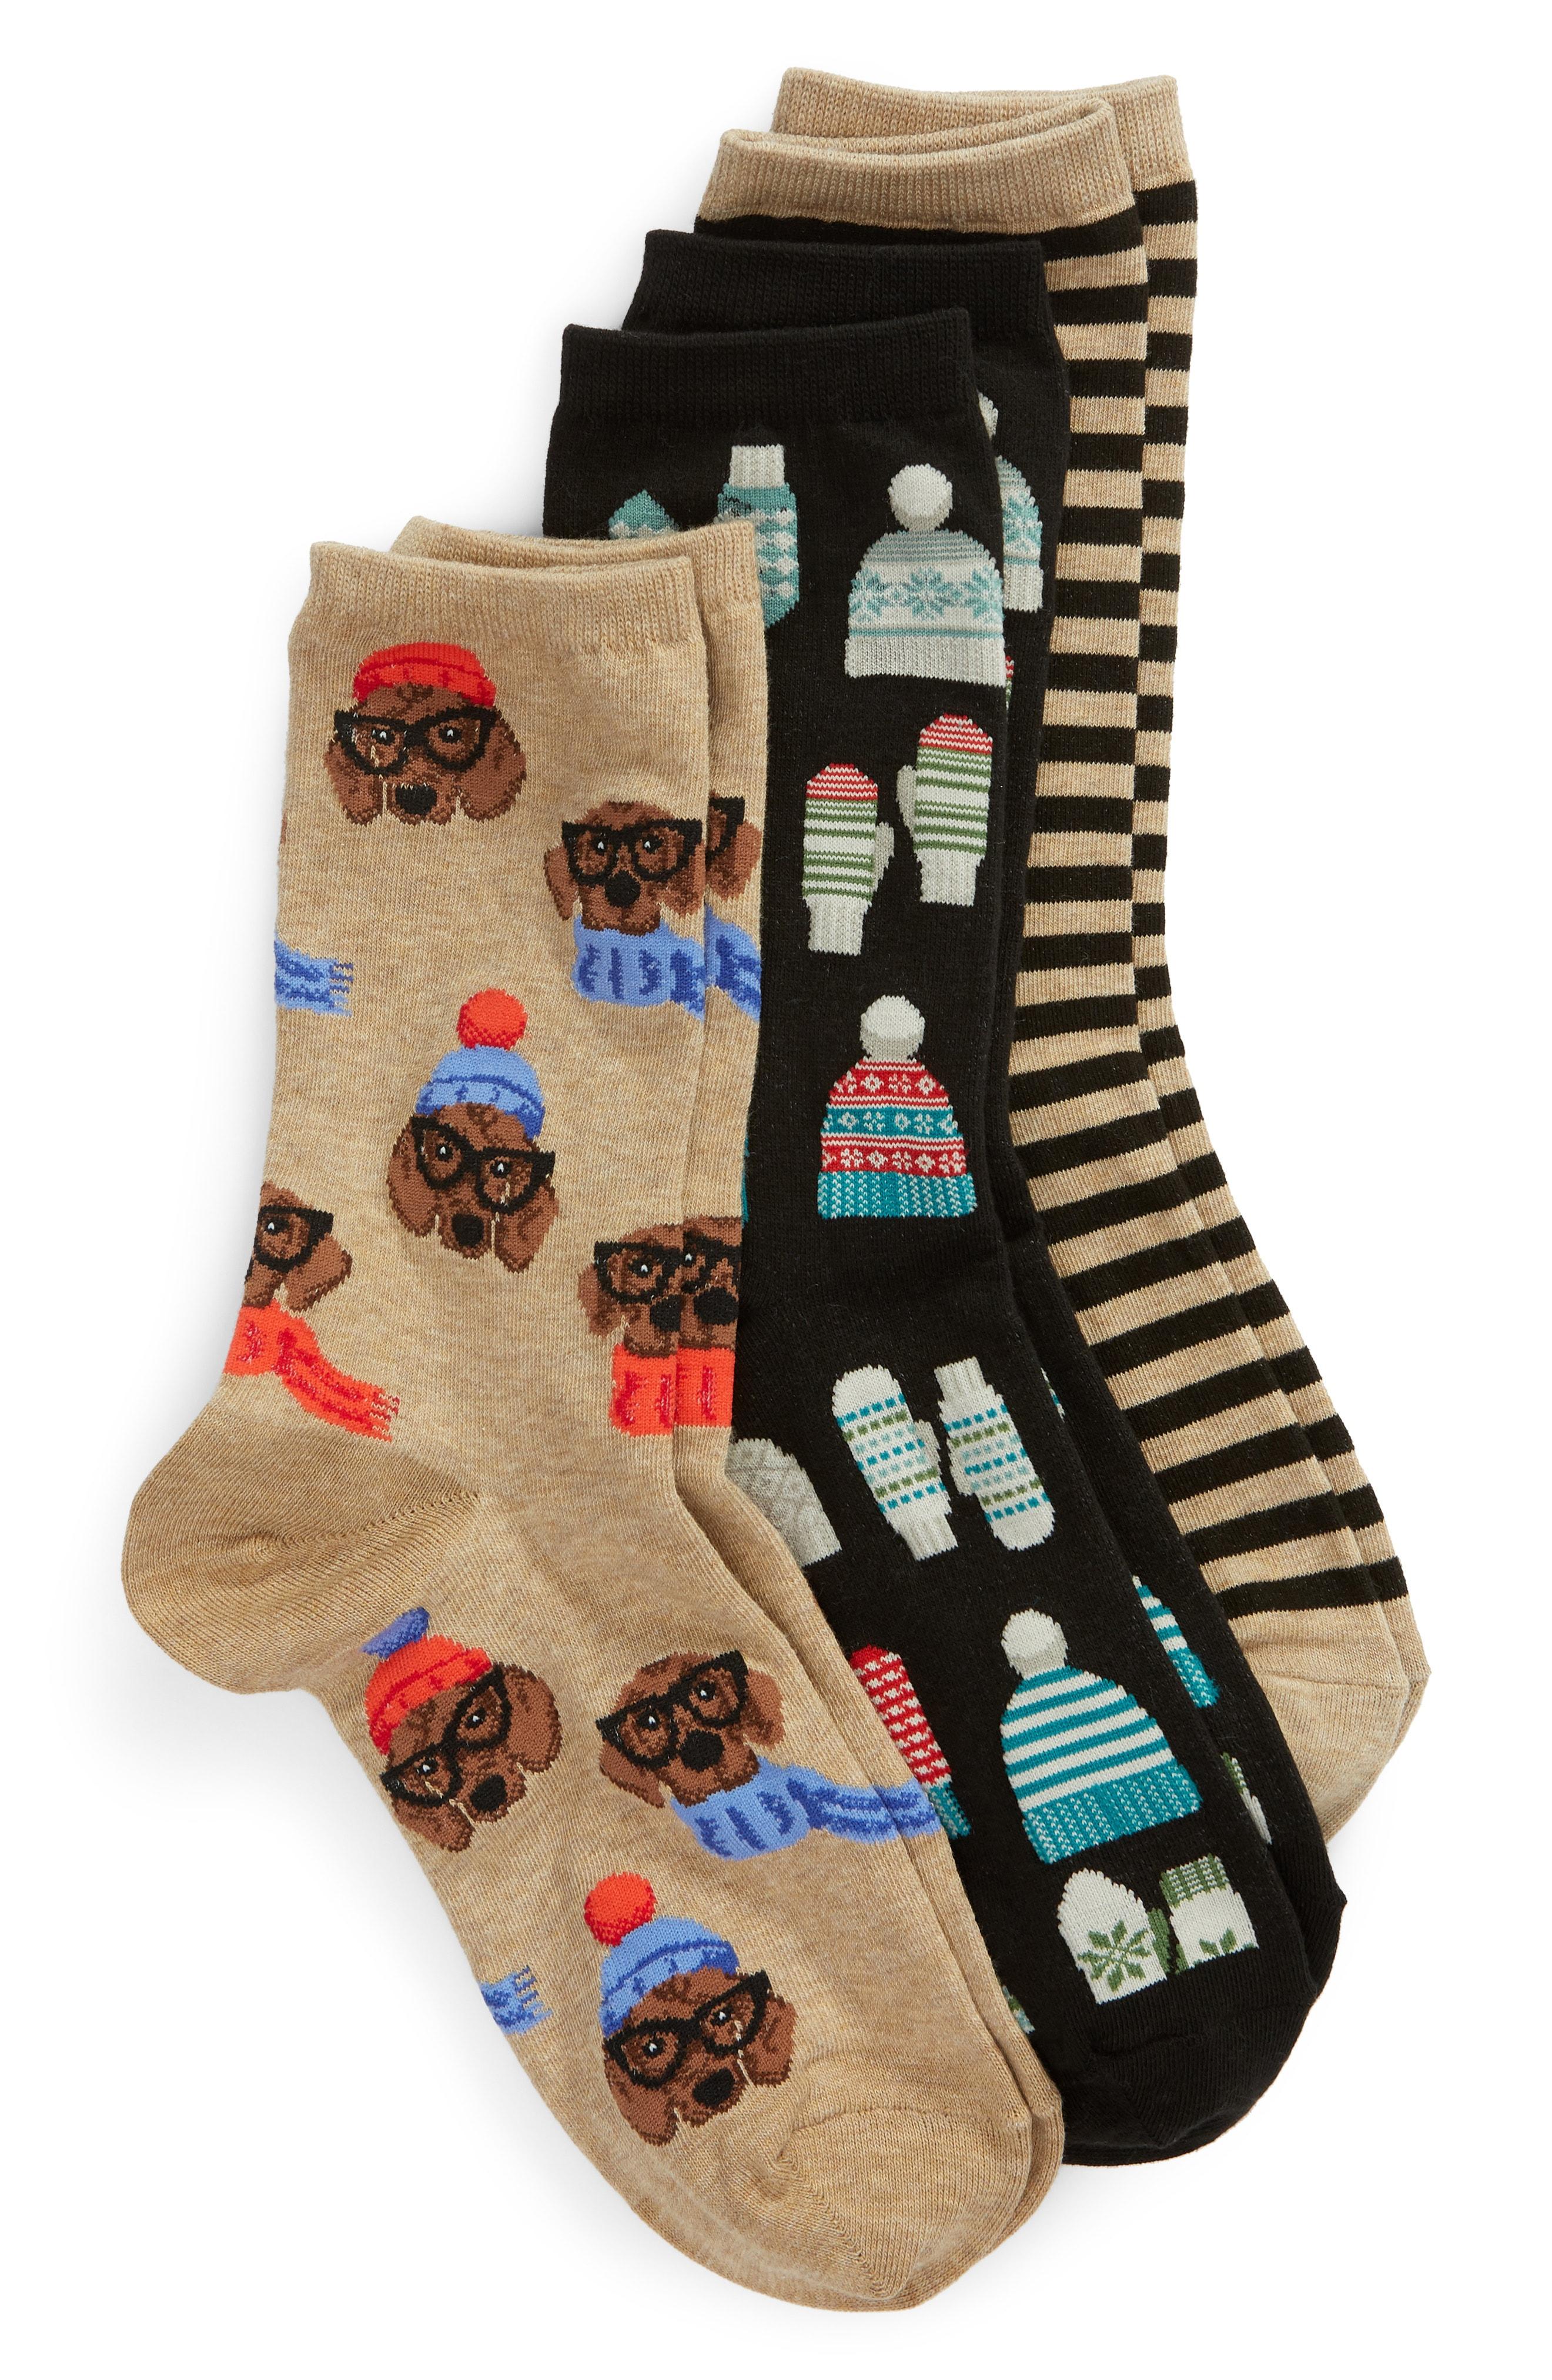 Hot Sox 3-Pack Mittens Socks